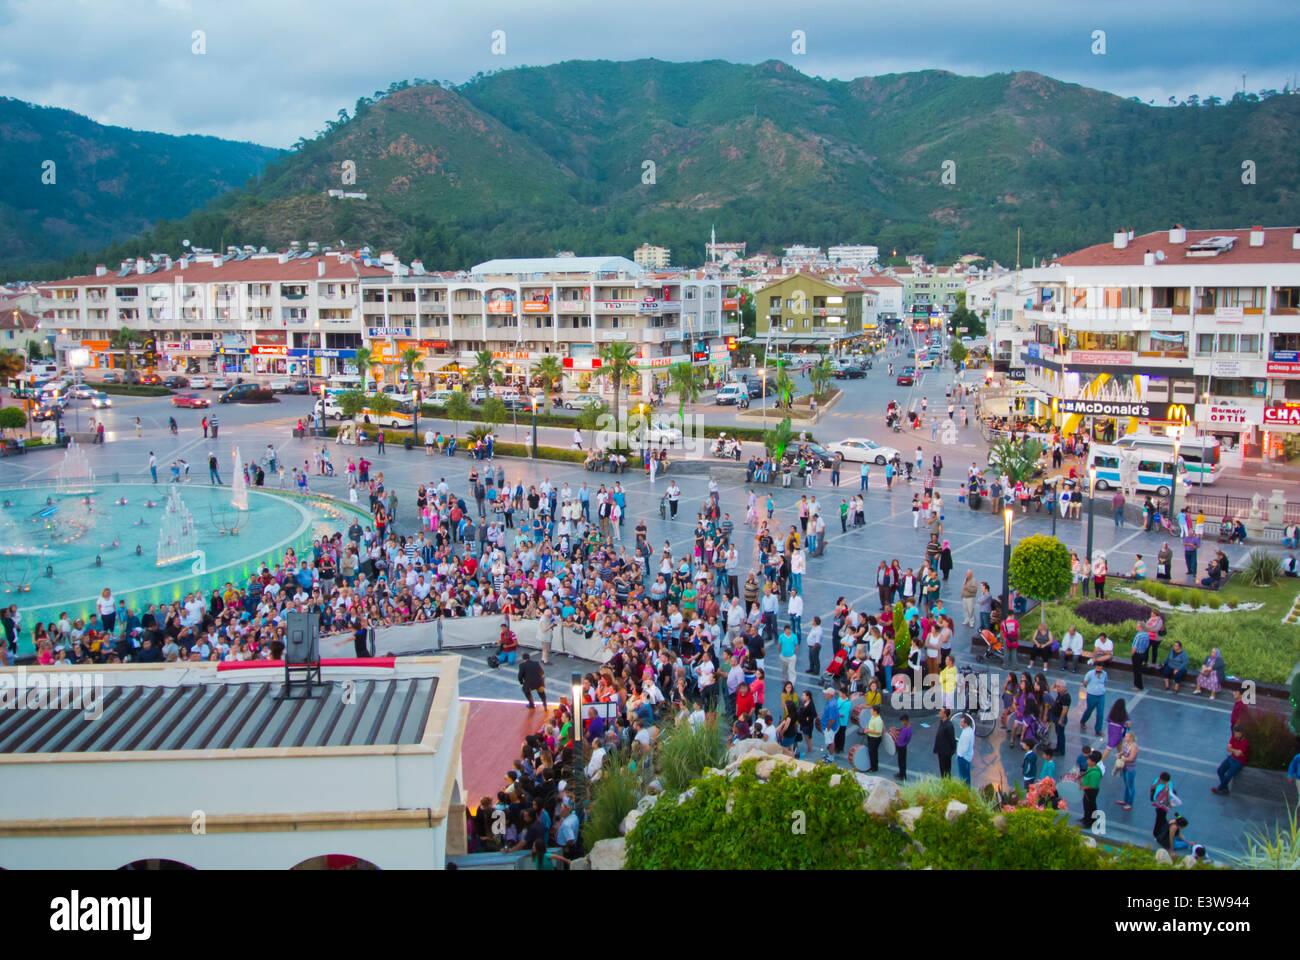 Crowds during evening show, 19 Mayis Genclik Meydani, 19th May Youth Square, main square, Marmaris, Mugla province, - Stock Image